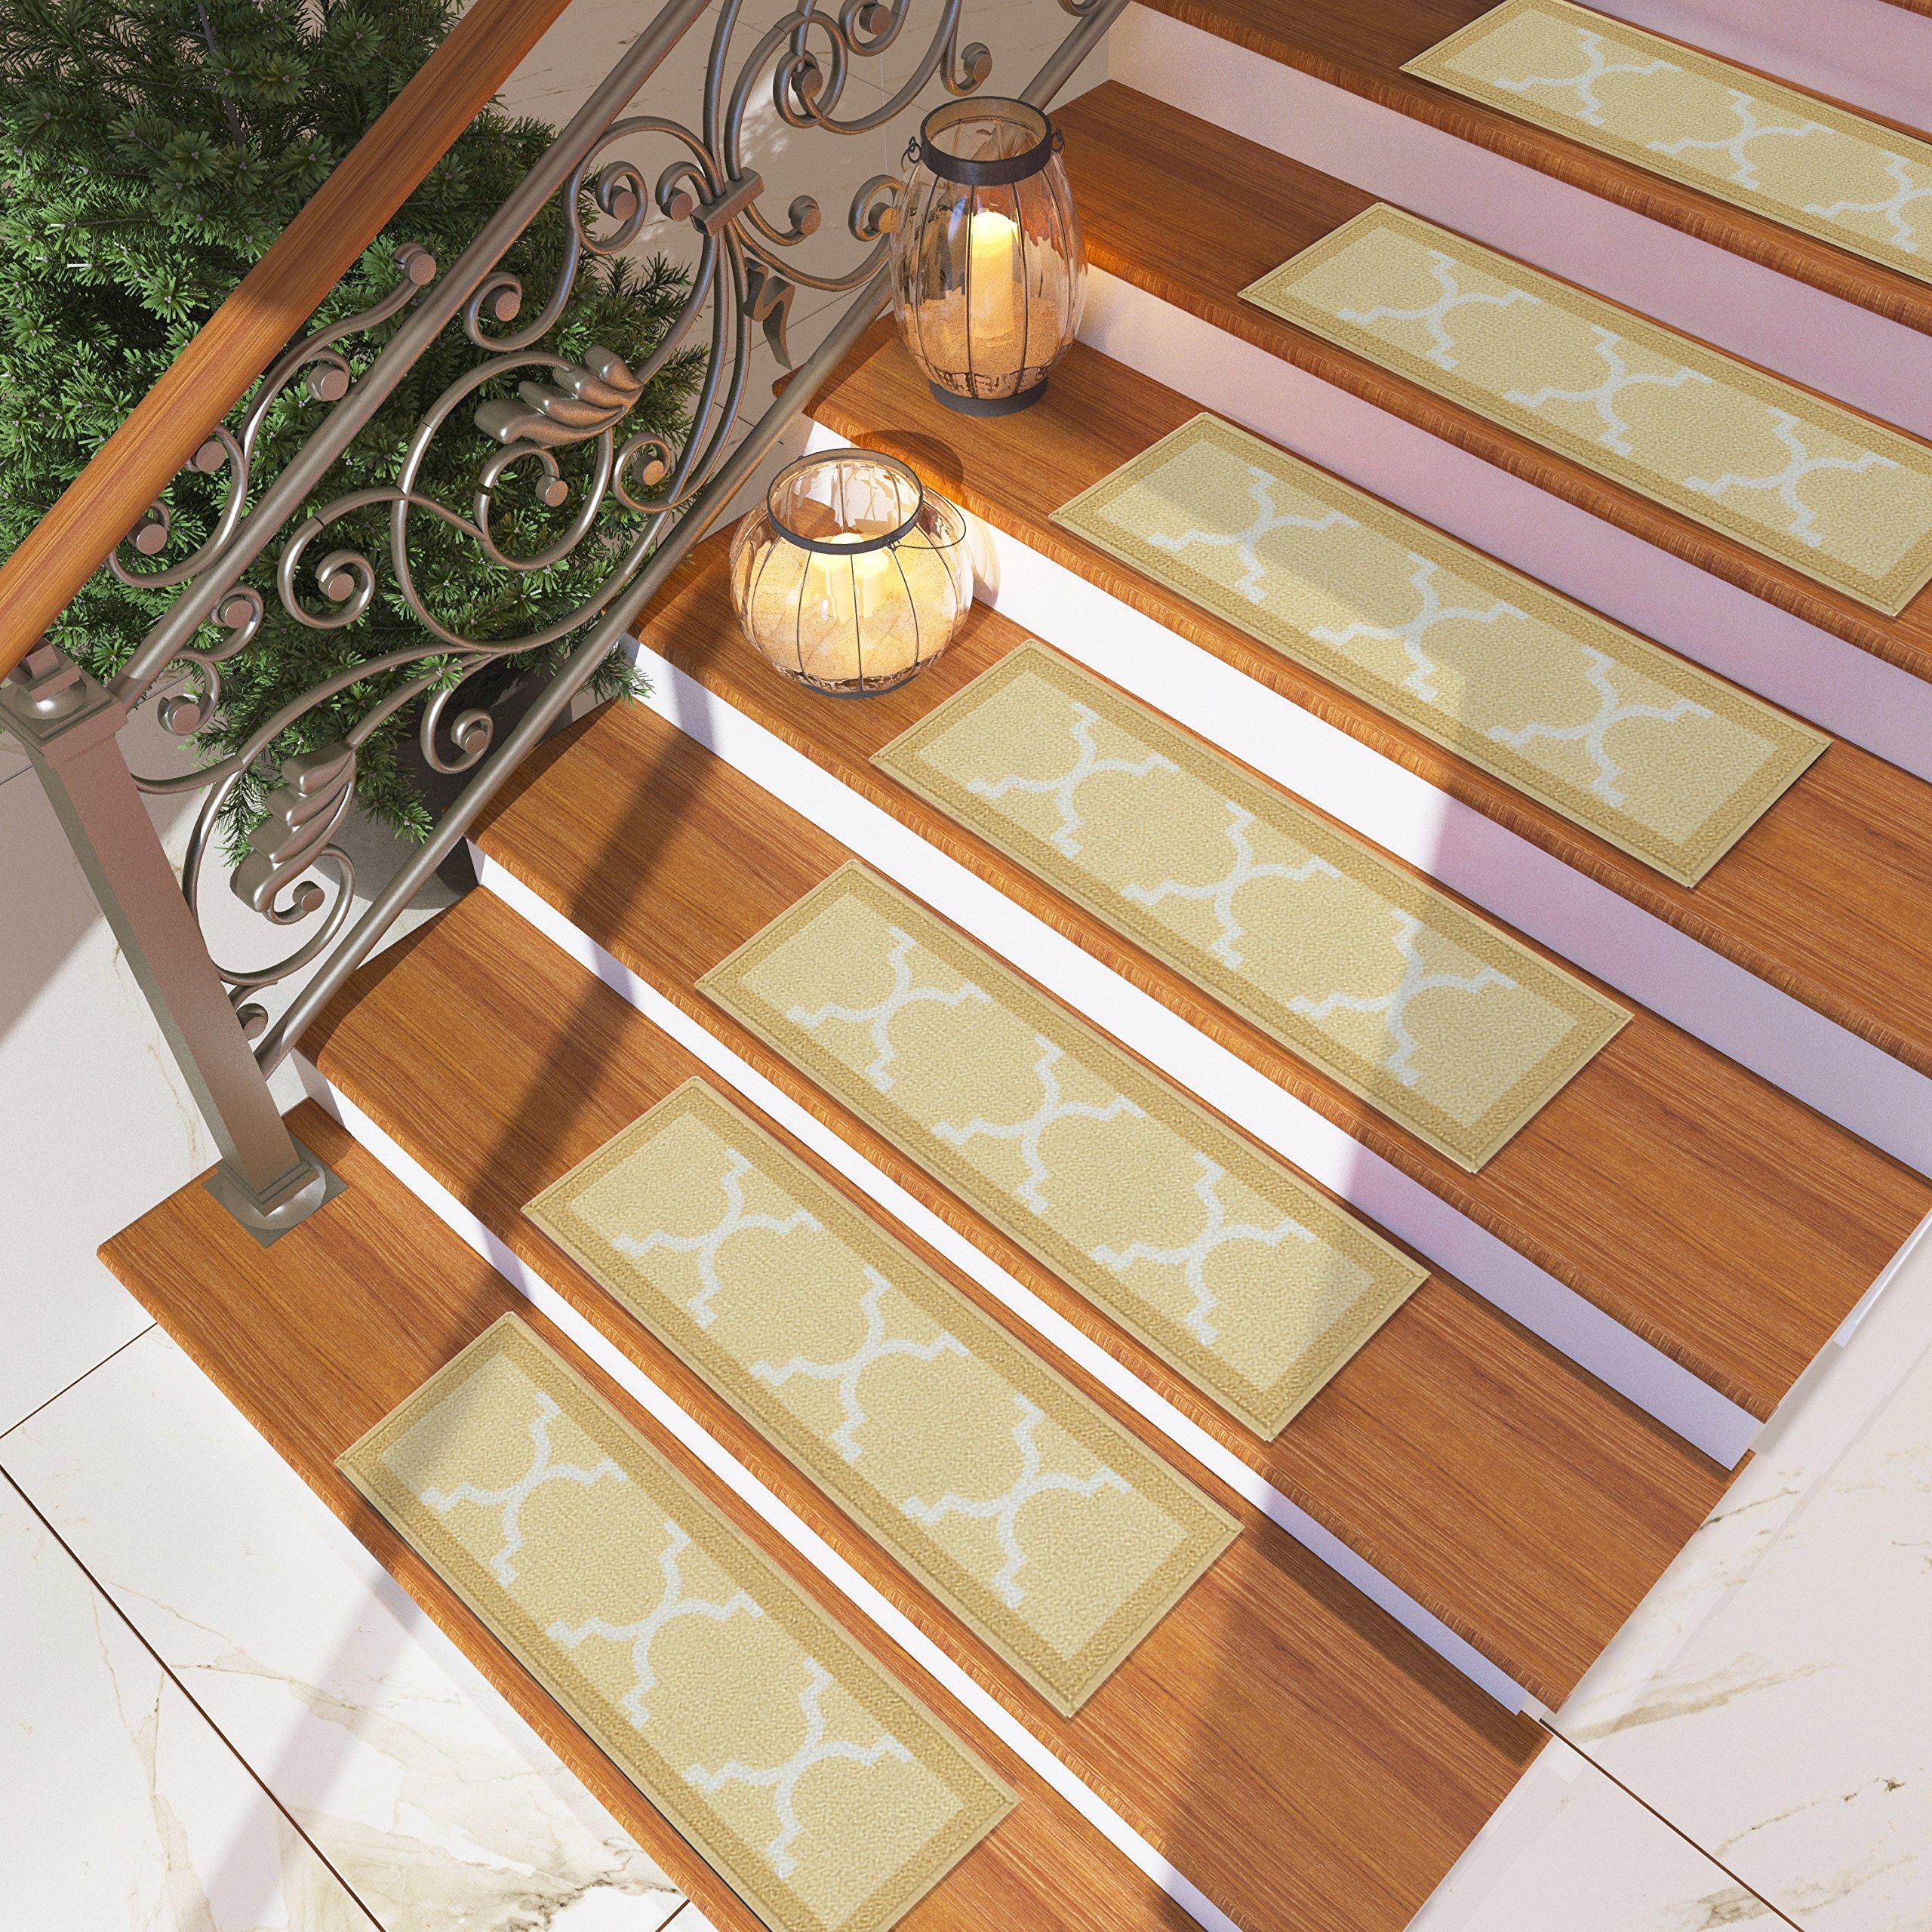 [Set of 7] Beige Stair Tread Rugs | Modern Design Trellis Lattice Carpet Treads [Easy to Clean] Rubber Non-slip Non-skid Backing | Nylon Low Pile 9'' x 27'' Stair Treads